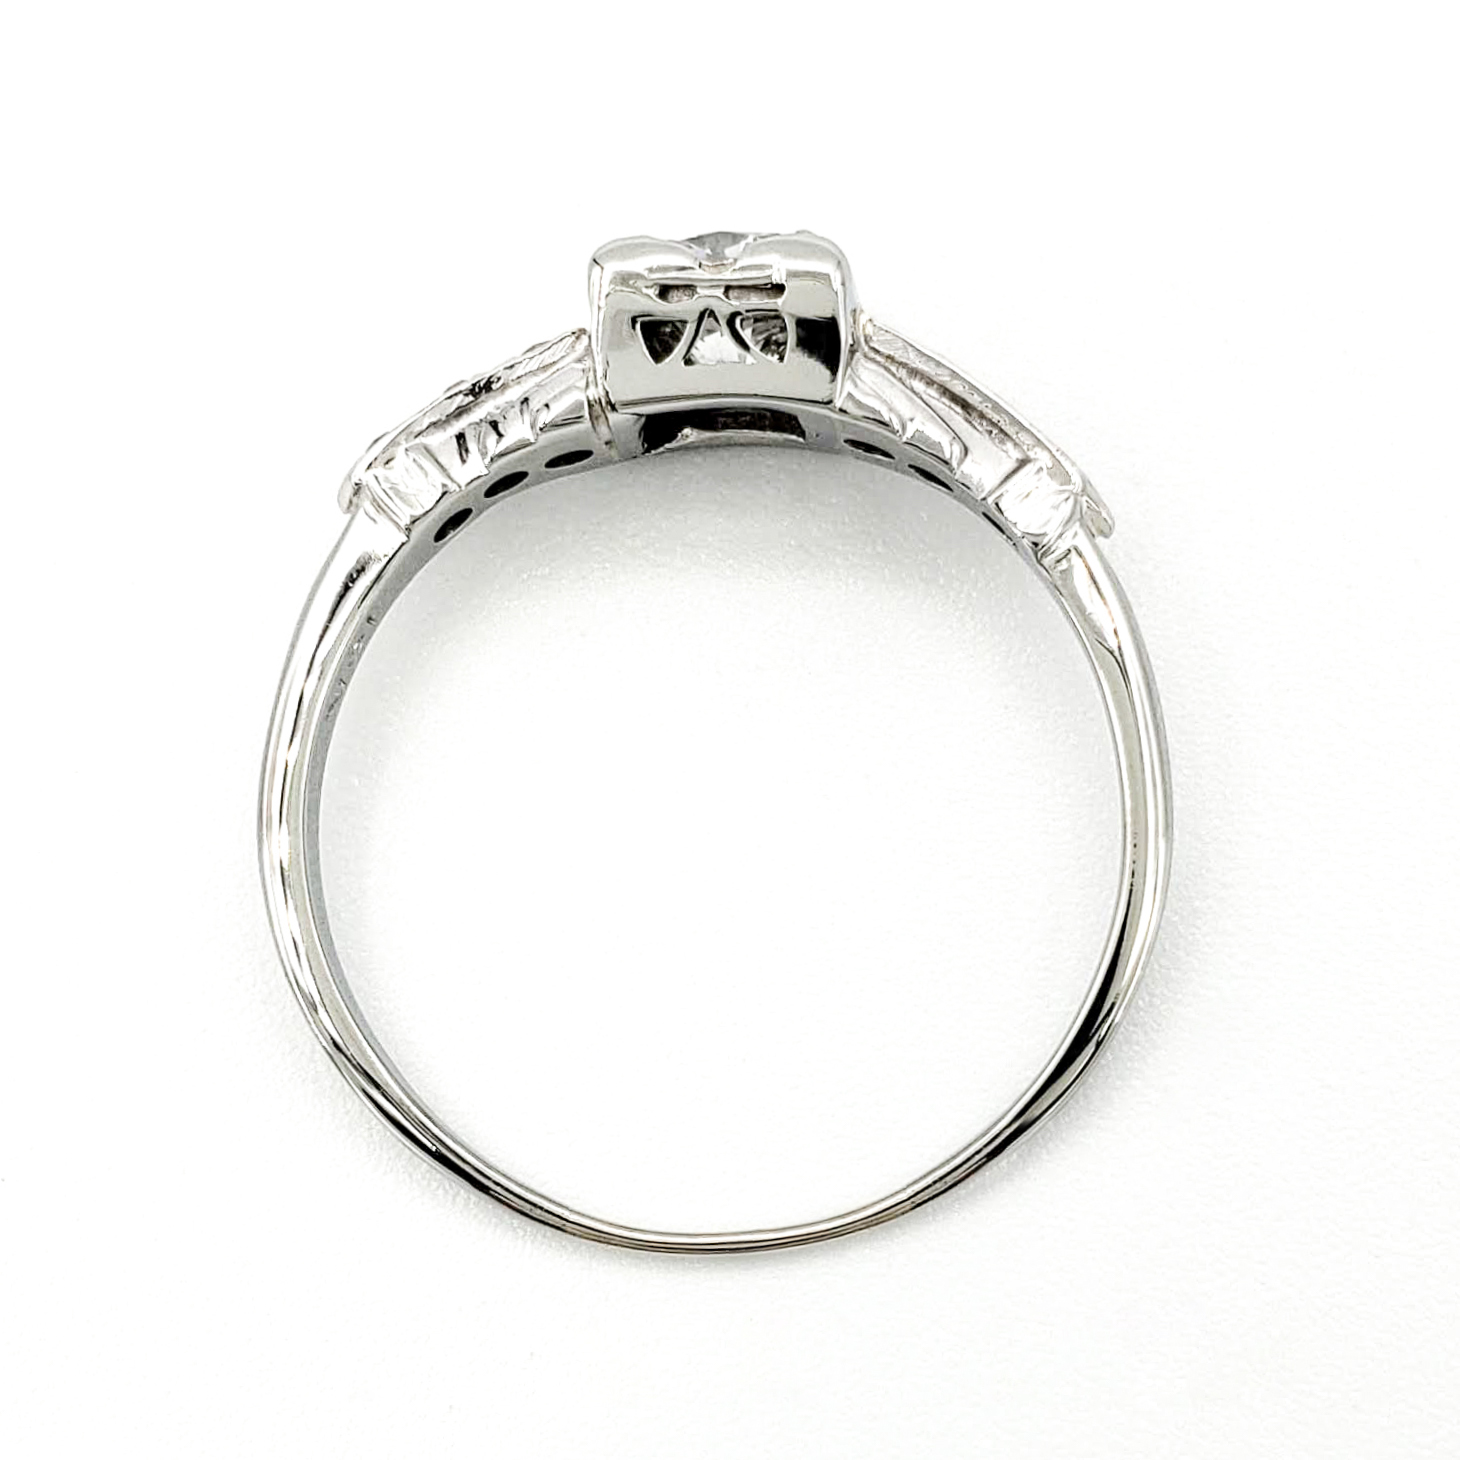 vintage-18-karat-gold-engagement-ring-with-0-49-carat-round-brilliant-cut-diamond-egl-e-vs1